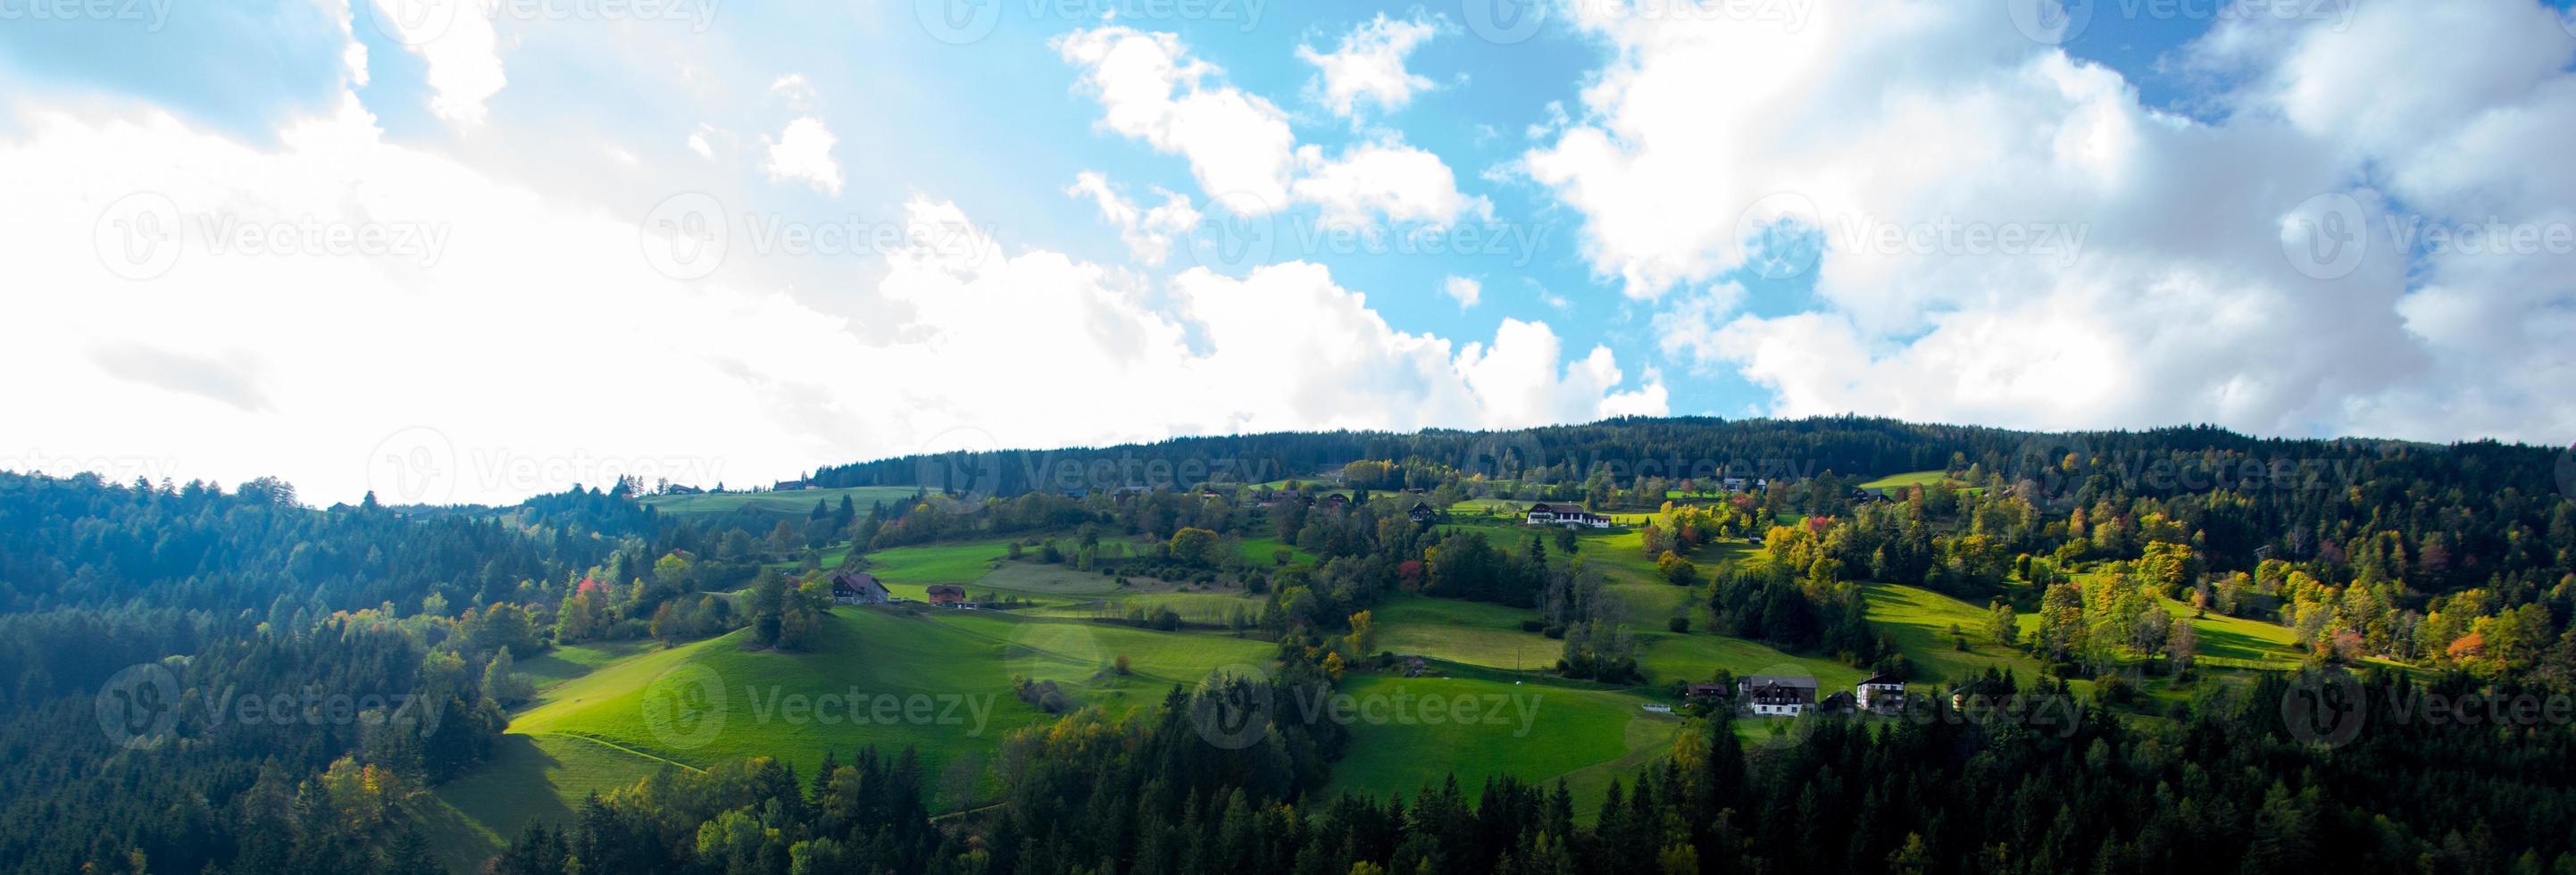 prati verde brillante e cielo blu foto